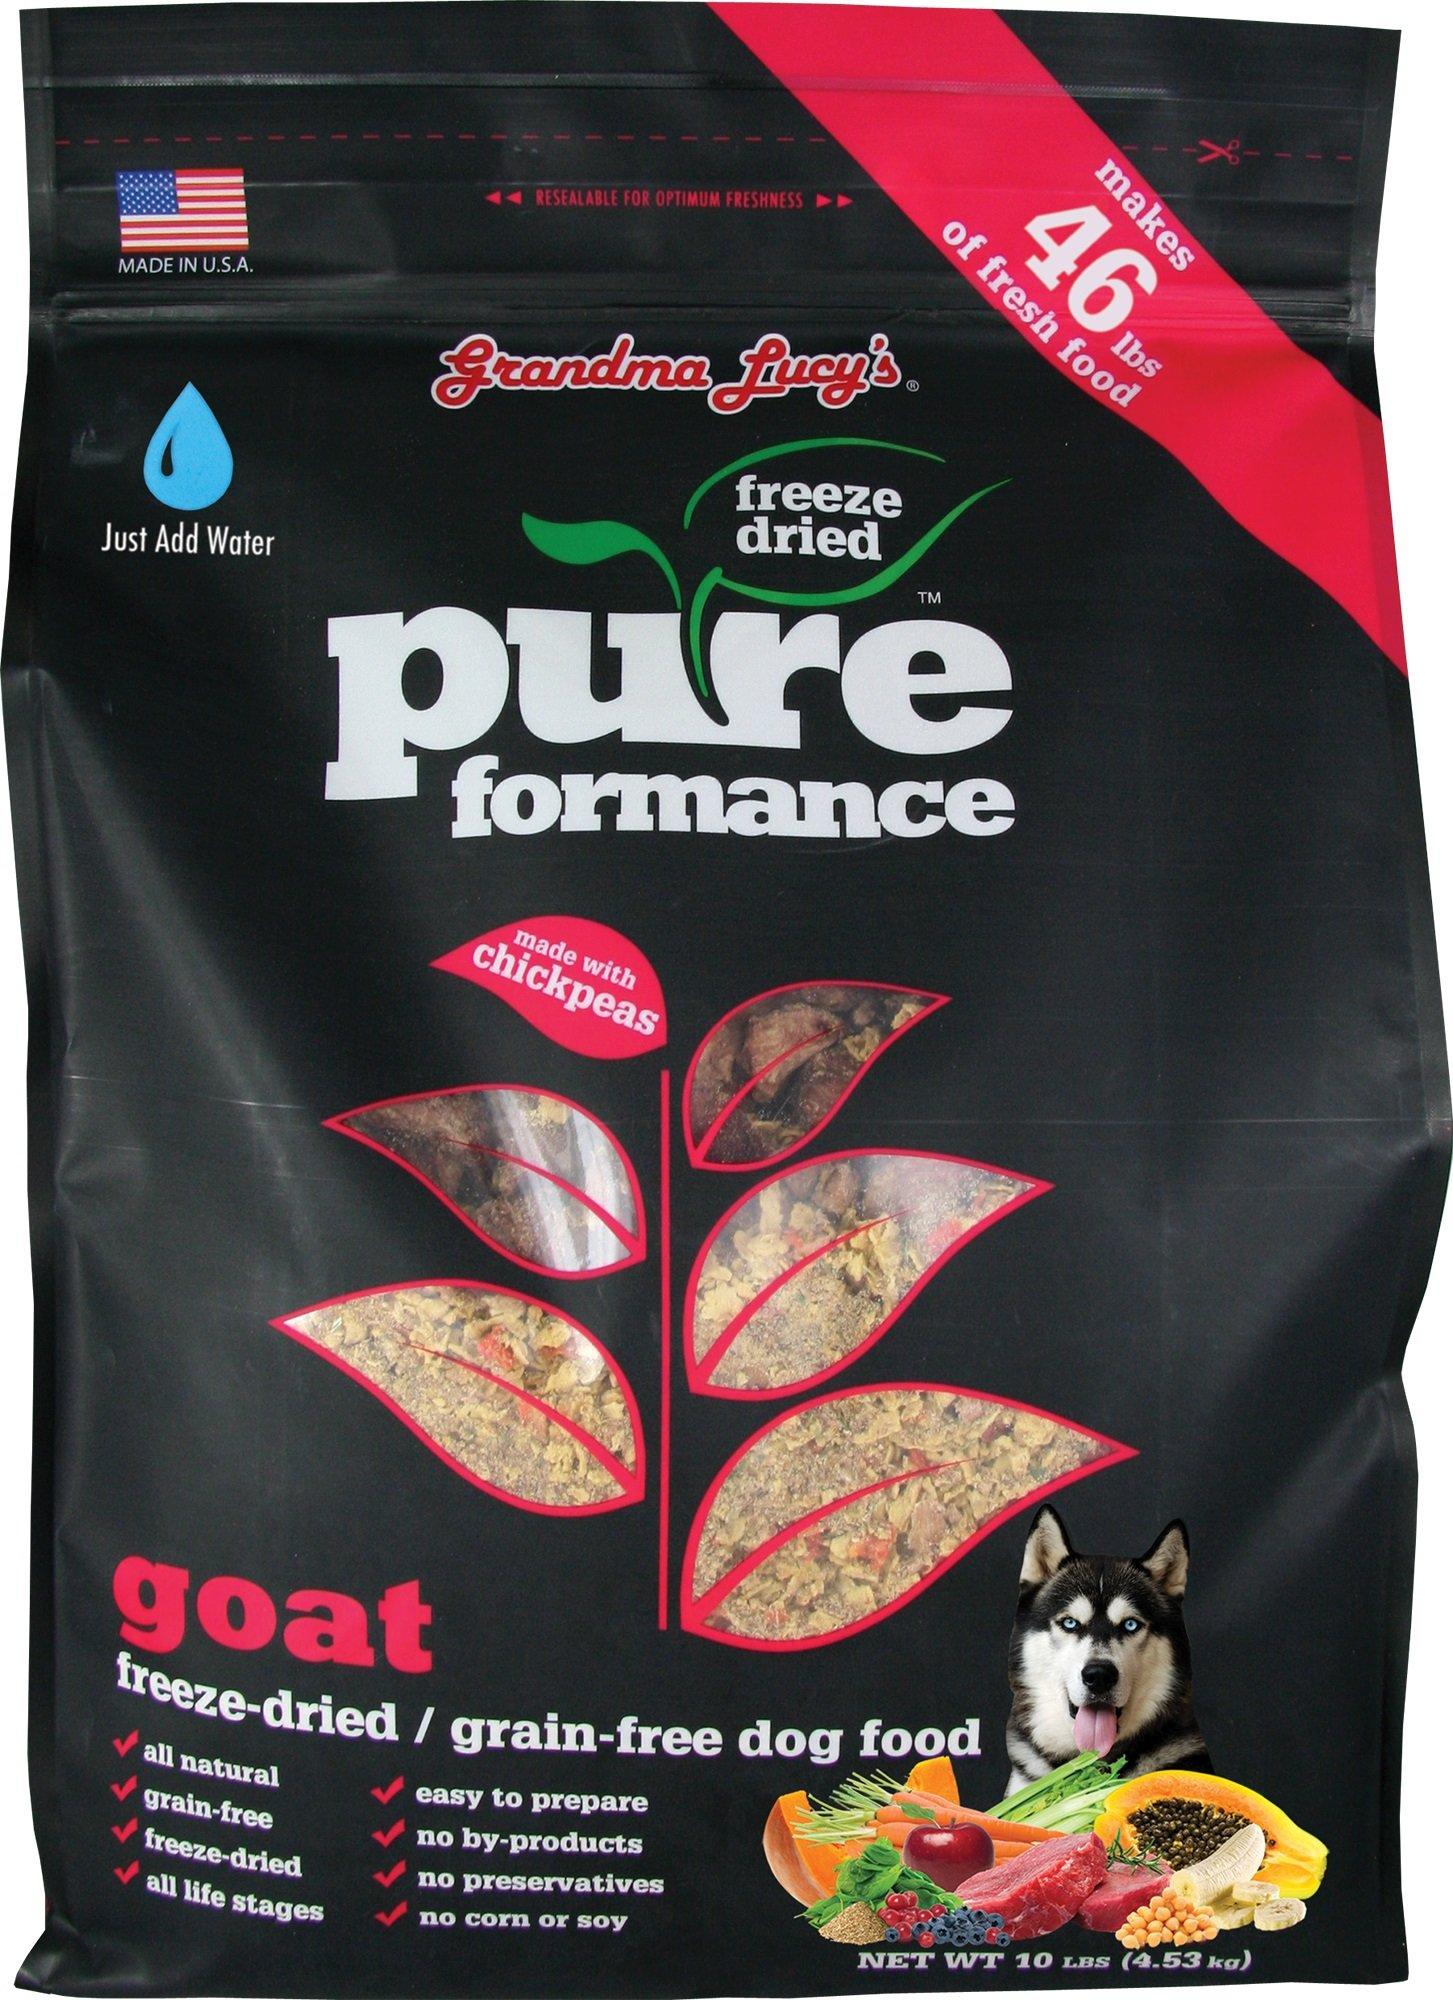 Grandma Lucy's Freeze-Dried Grain-Free Pet Food: Pureformance Goat 10lbs